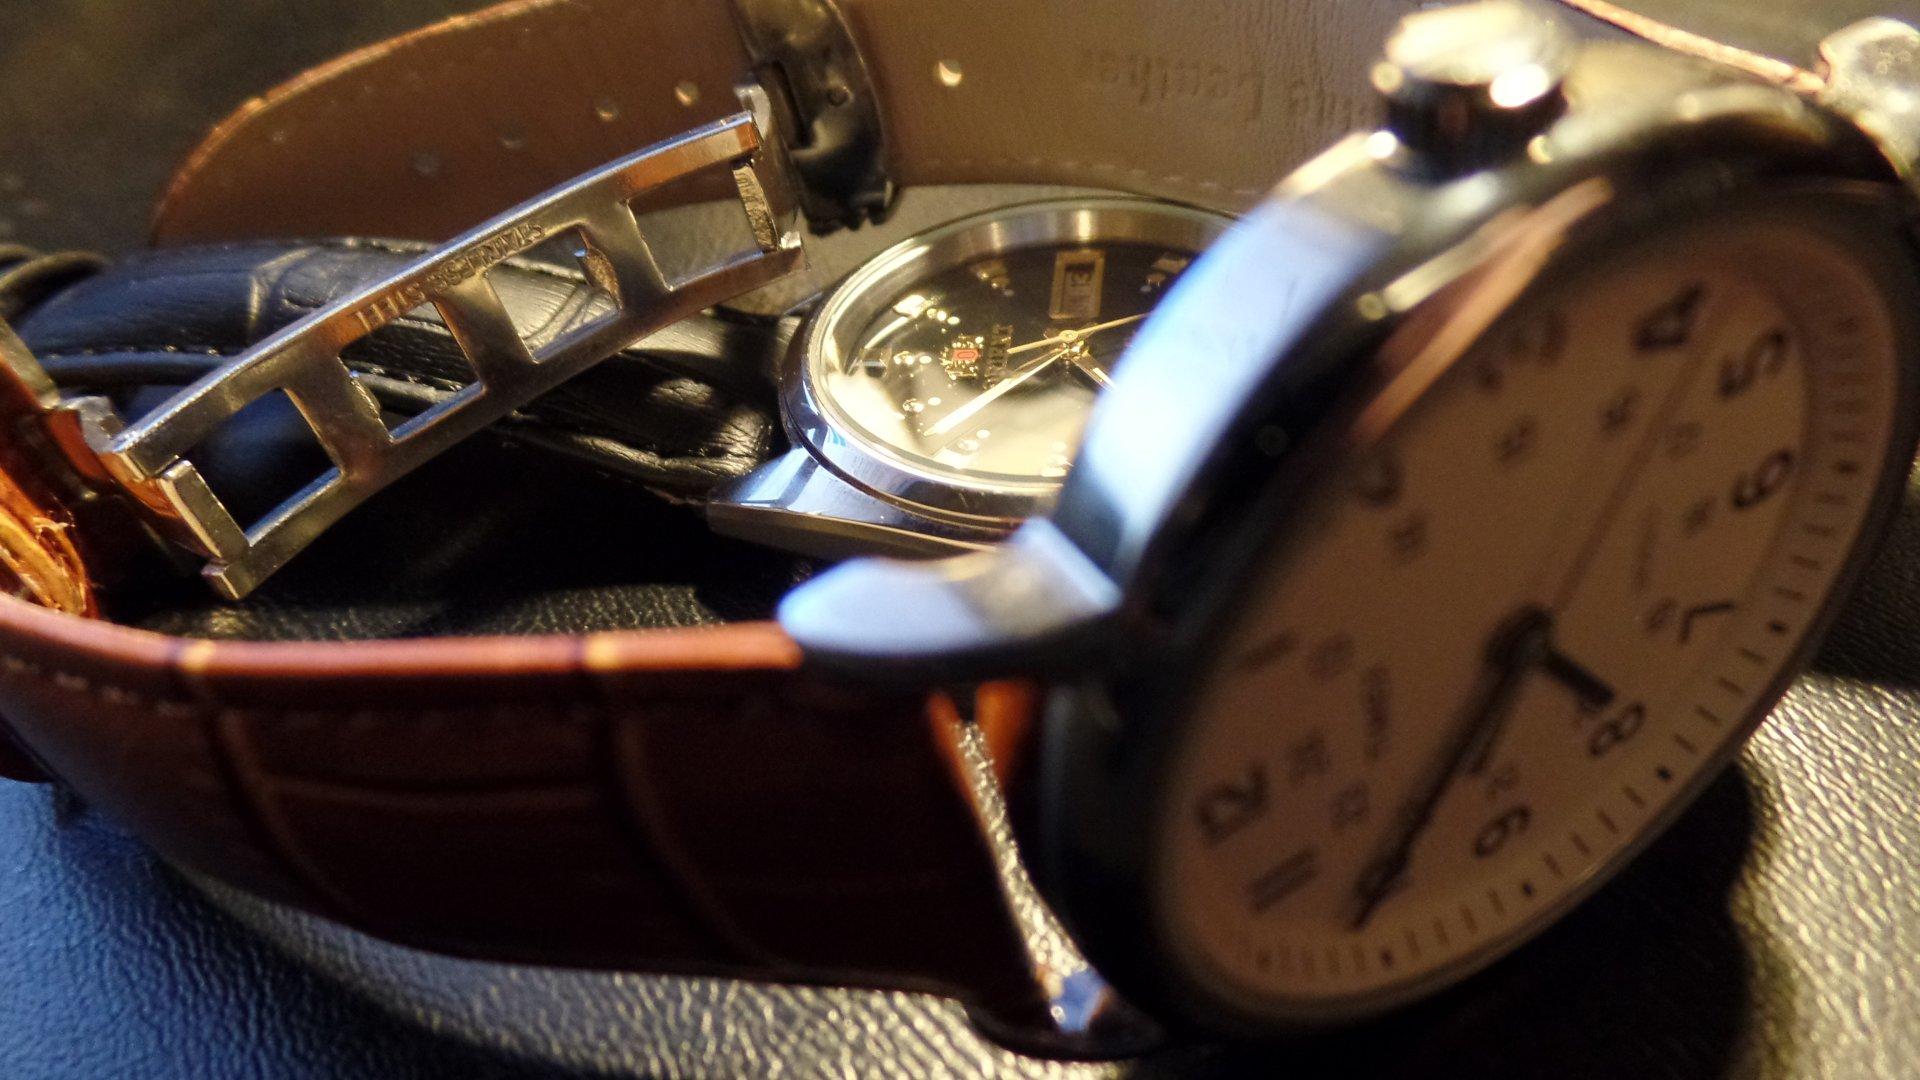 Orient Tri Star and Timex Weekender